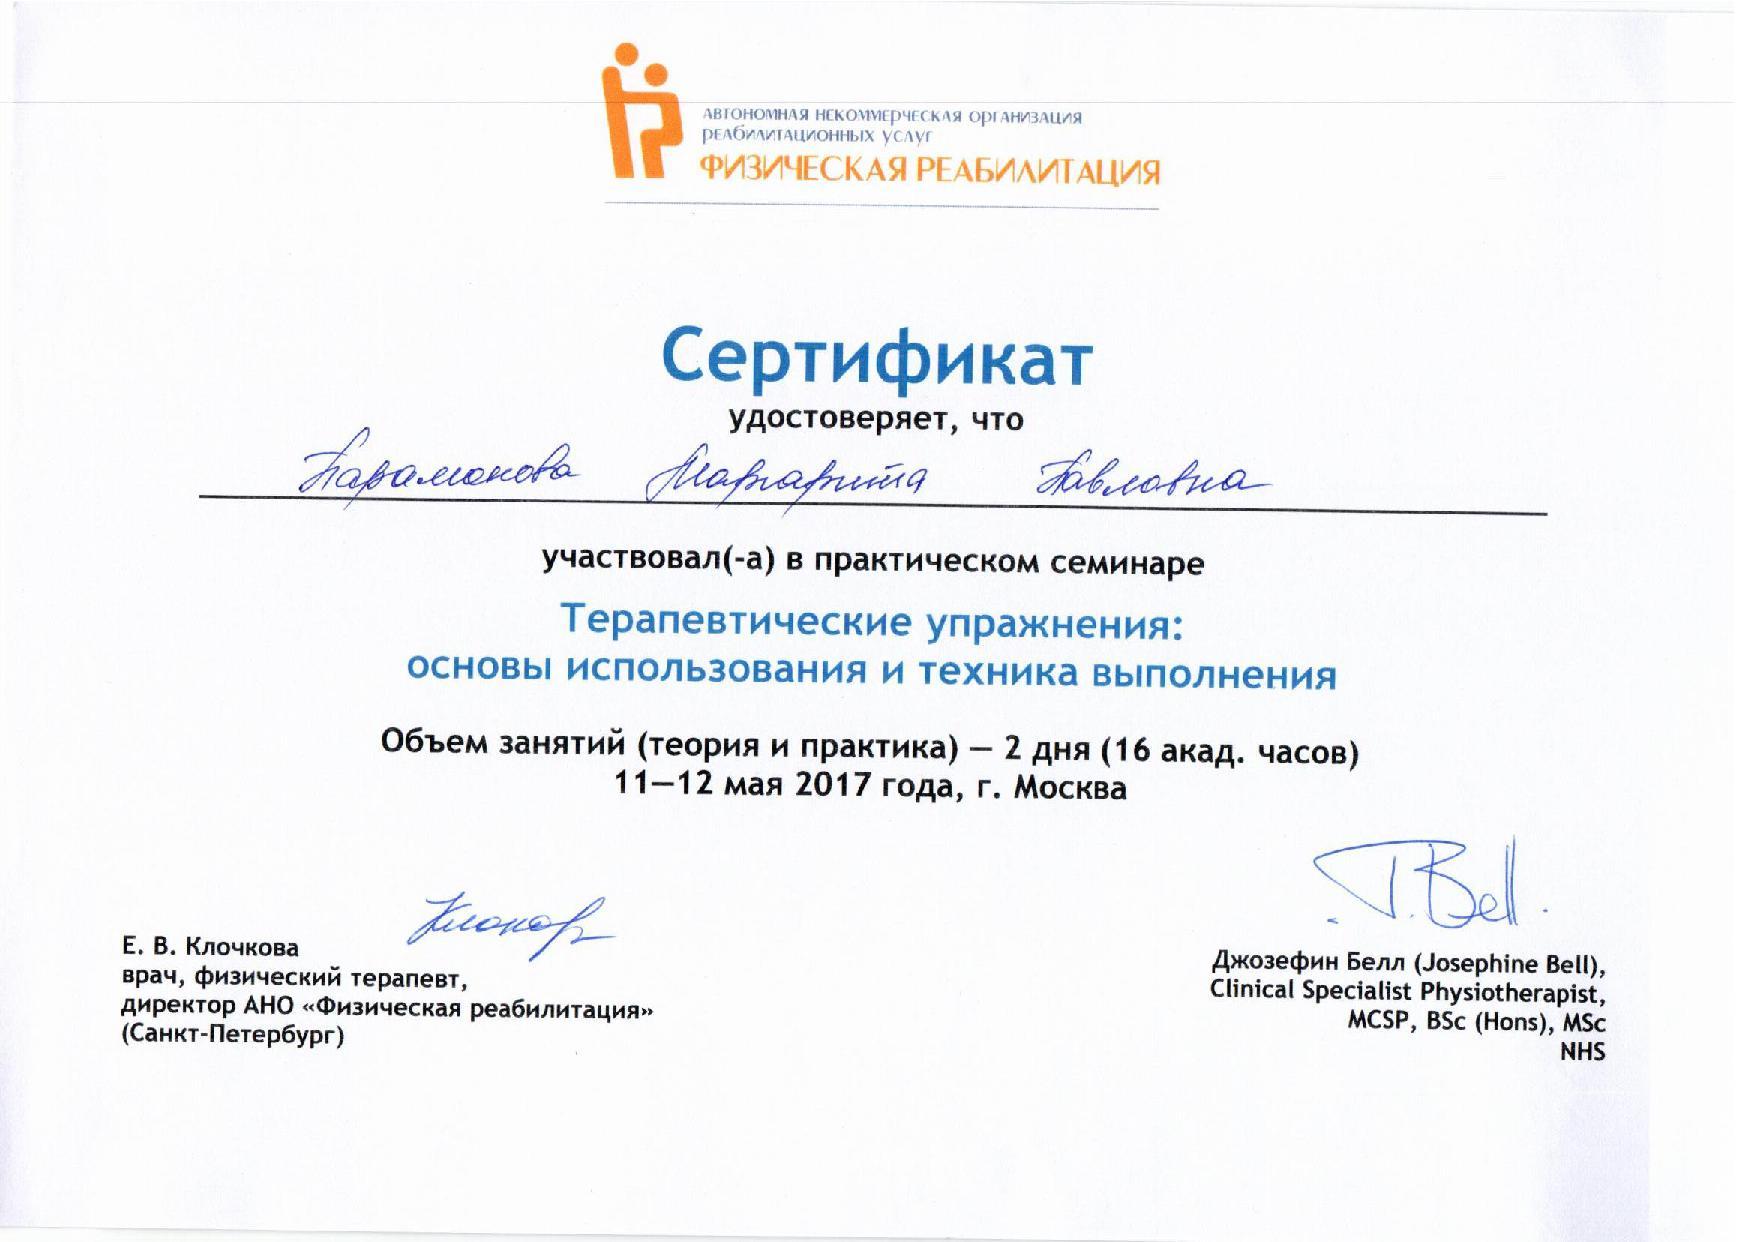 32 Серт_ТерапУпрОснИспТехнВып_05